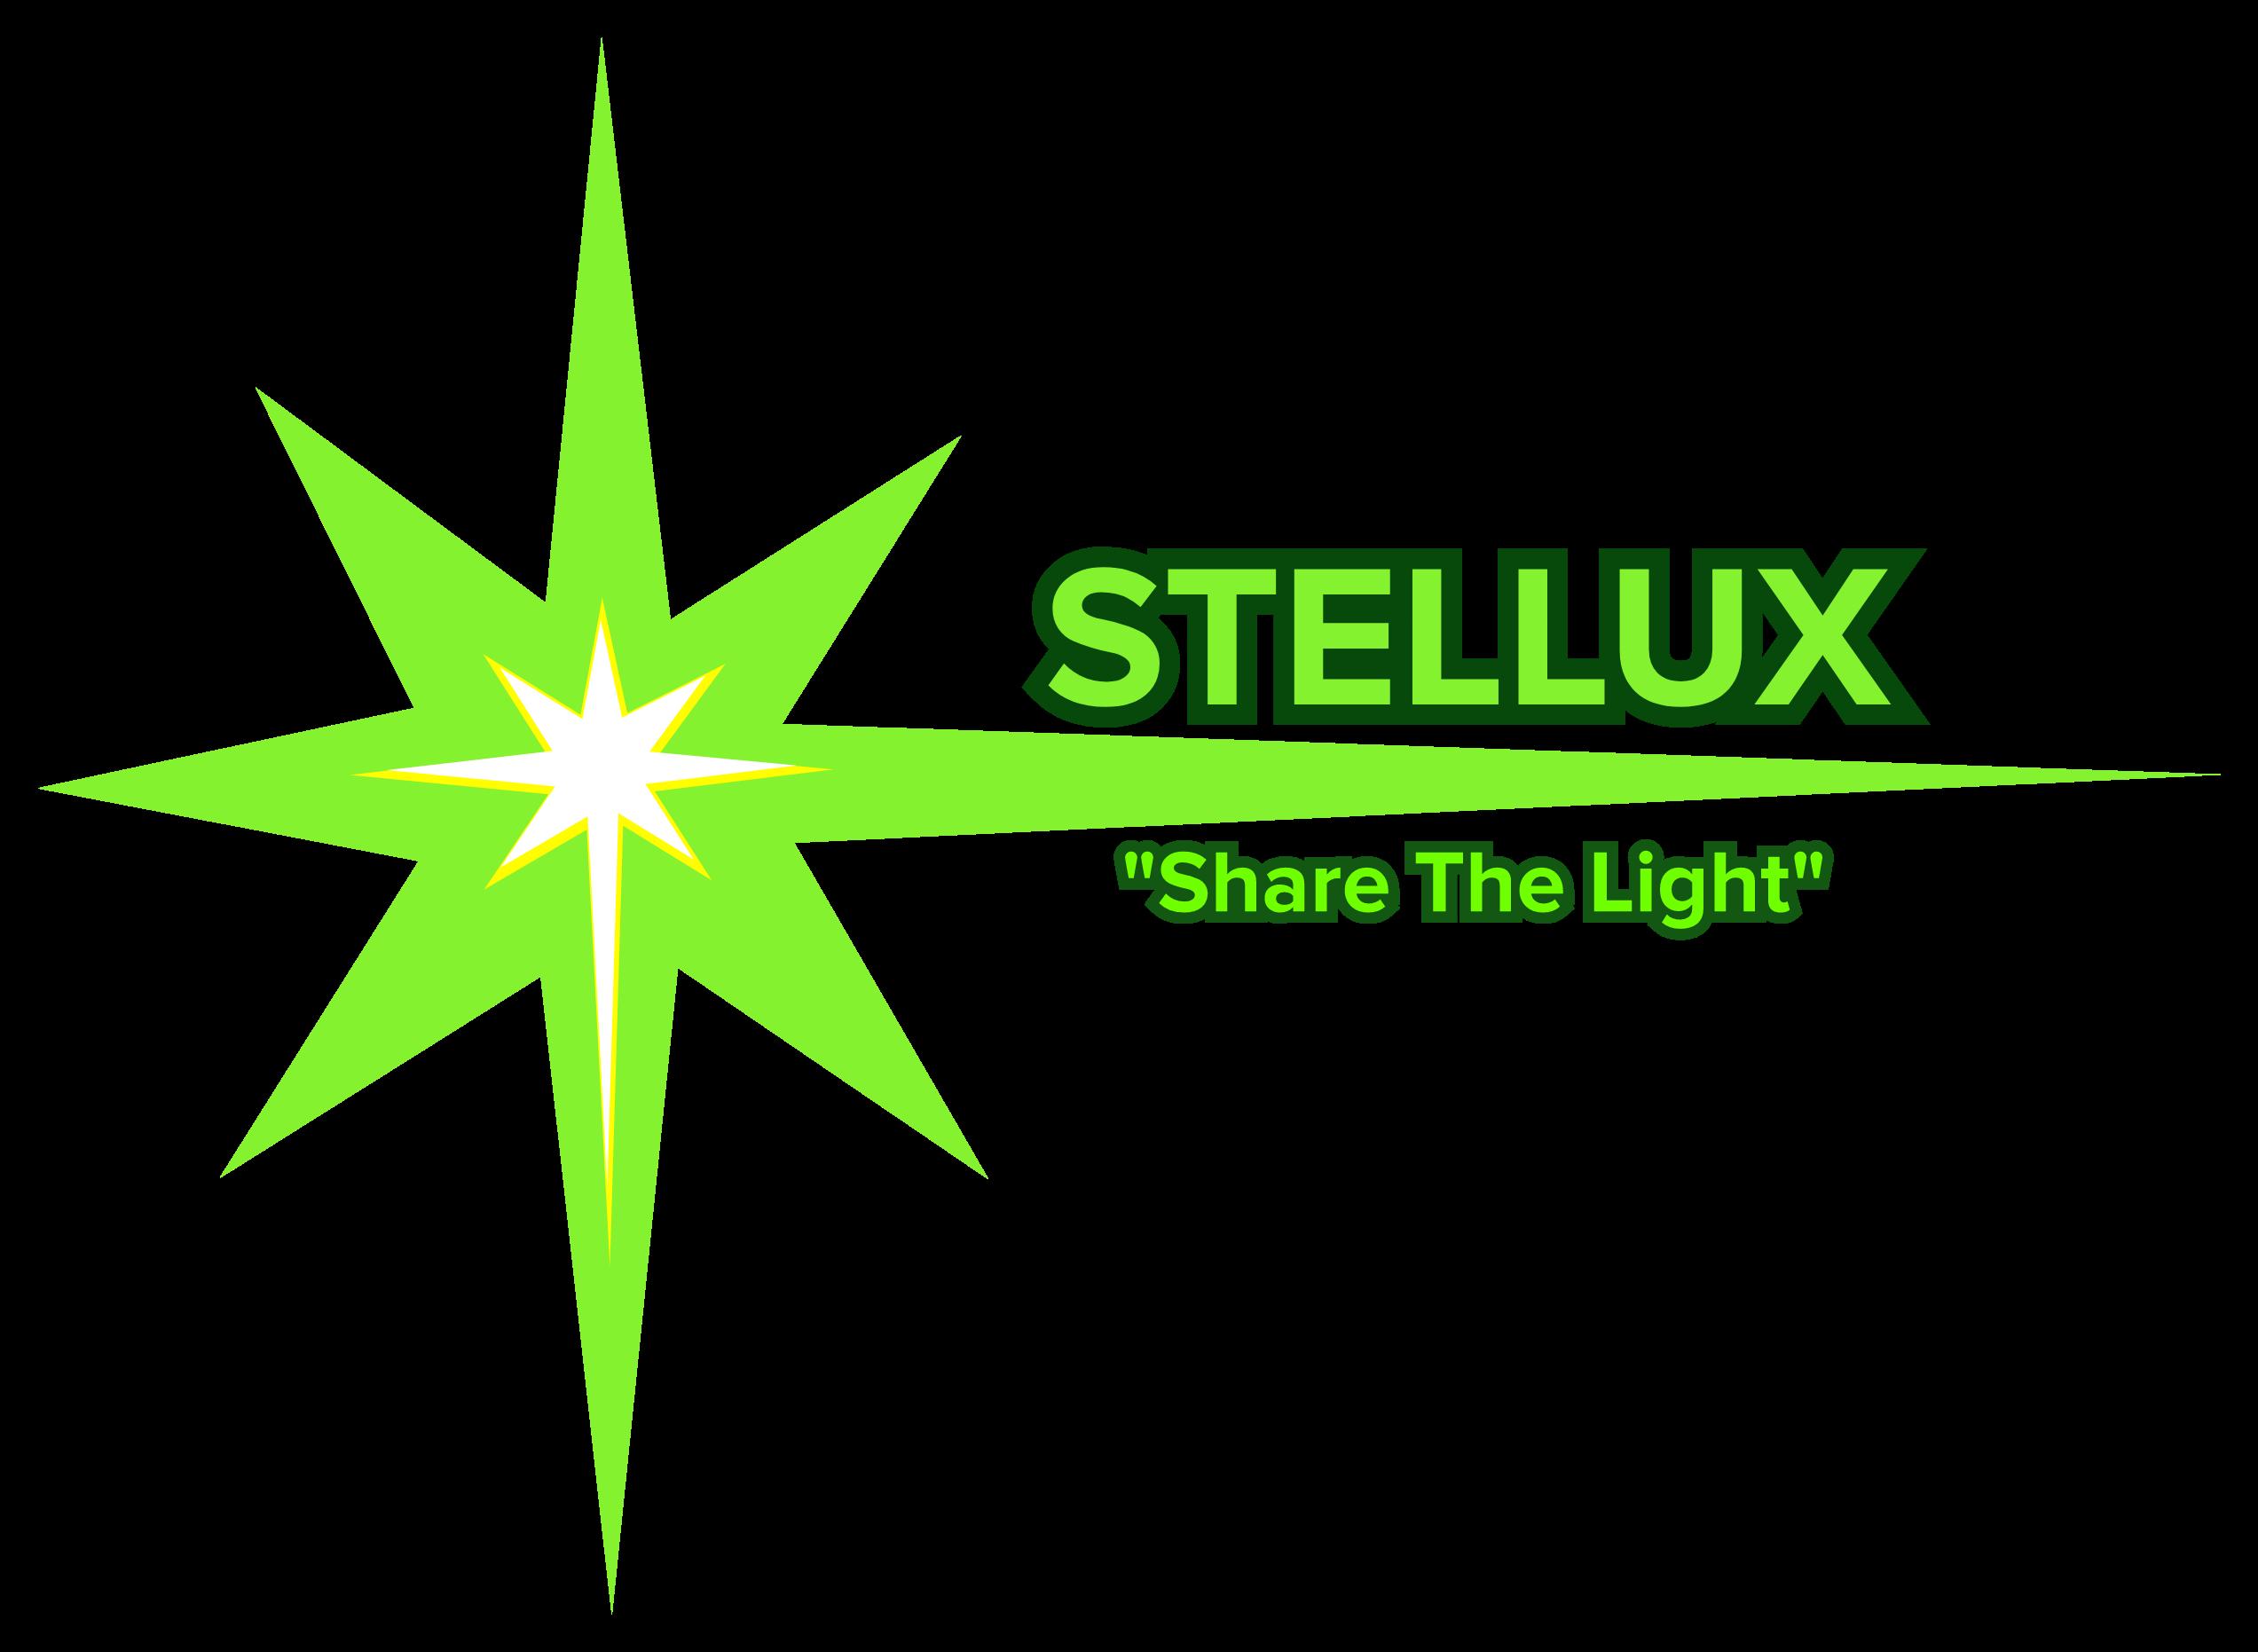 StelluxLogo